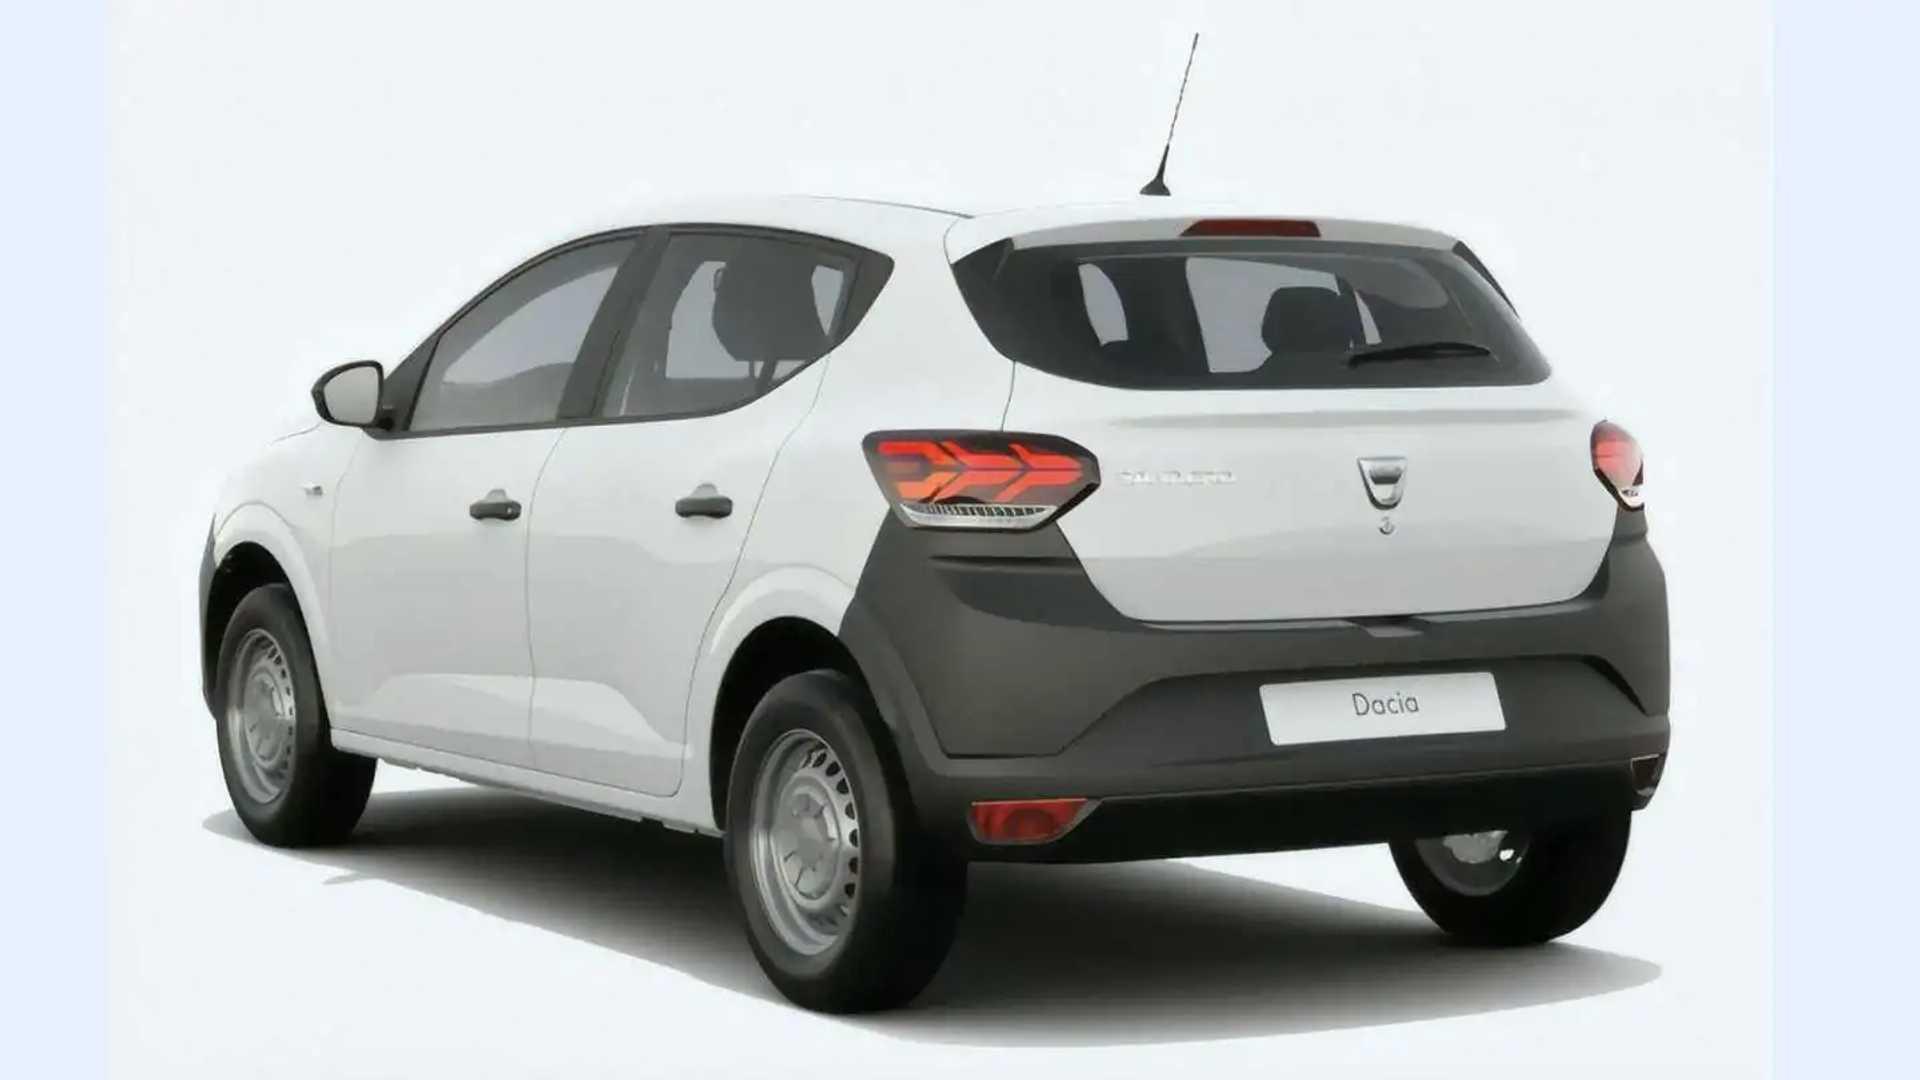 Dacia Sandero Aquis 2021